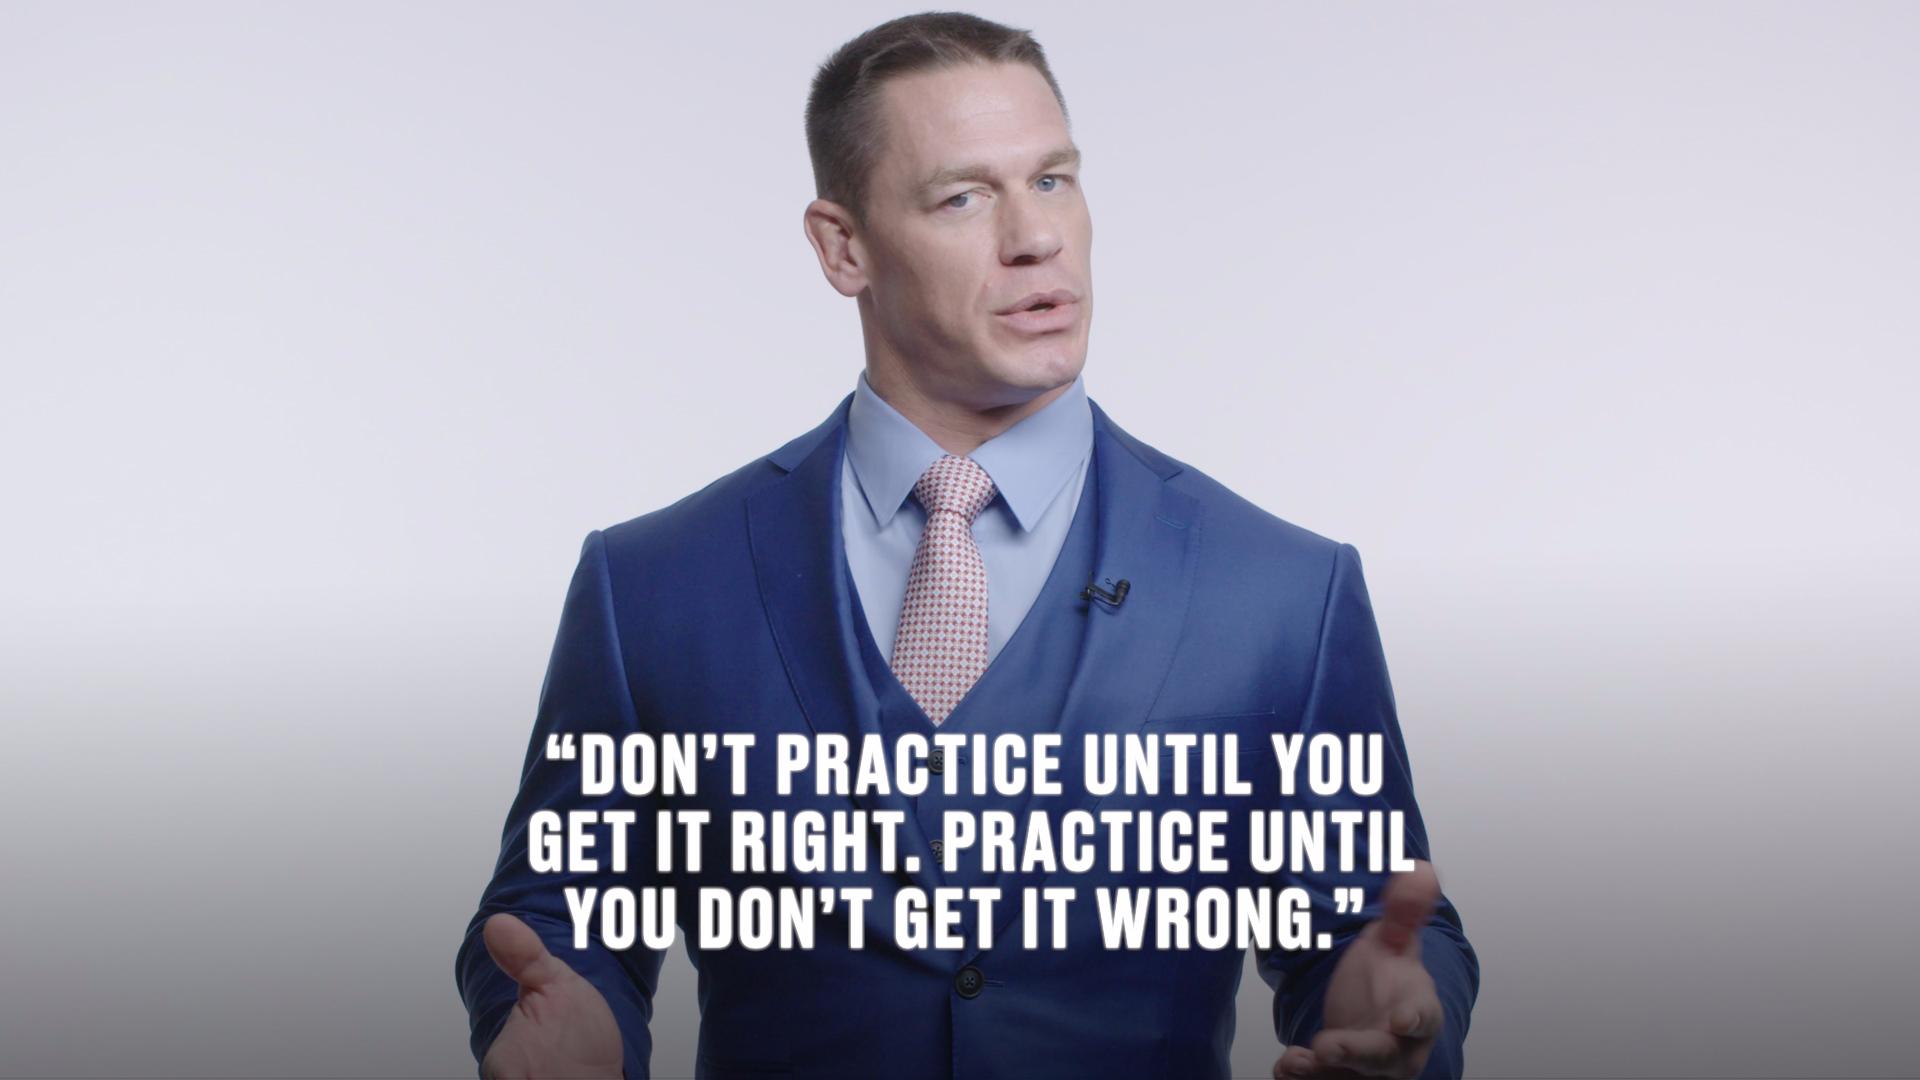 John Cena's Words of Wisdom: WWE Star Shares His Inspirational Advice